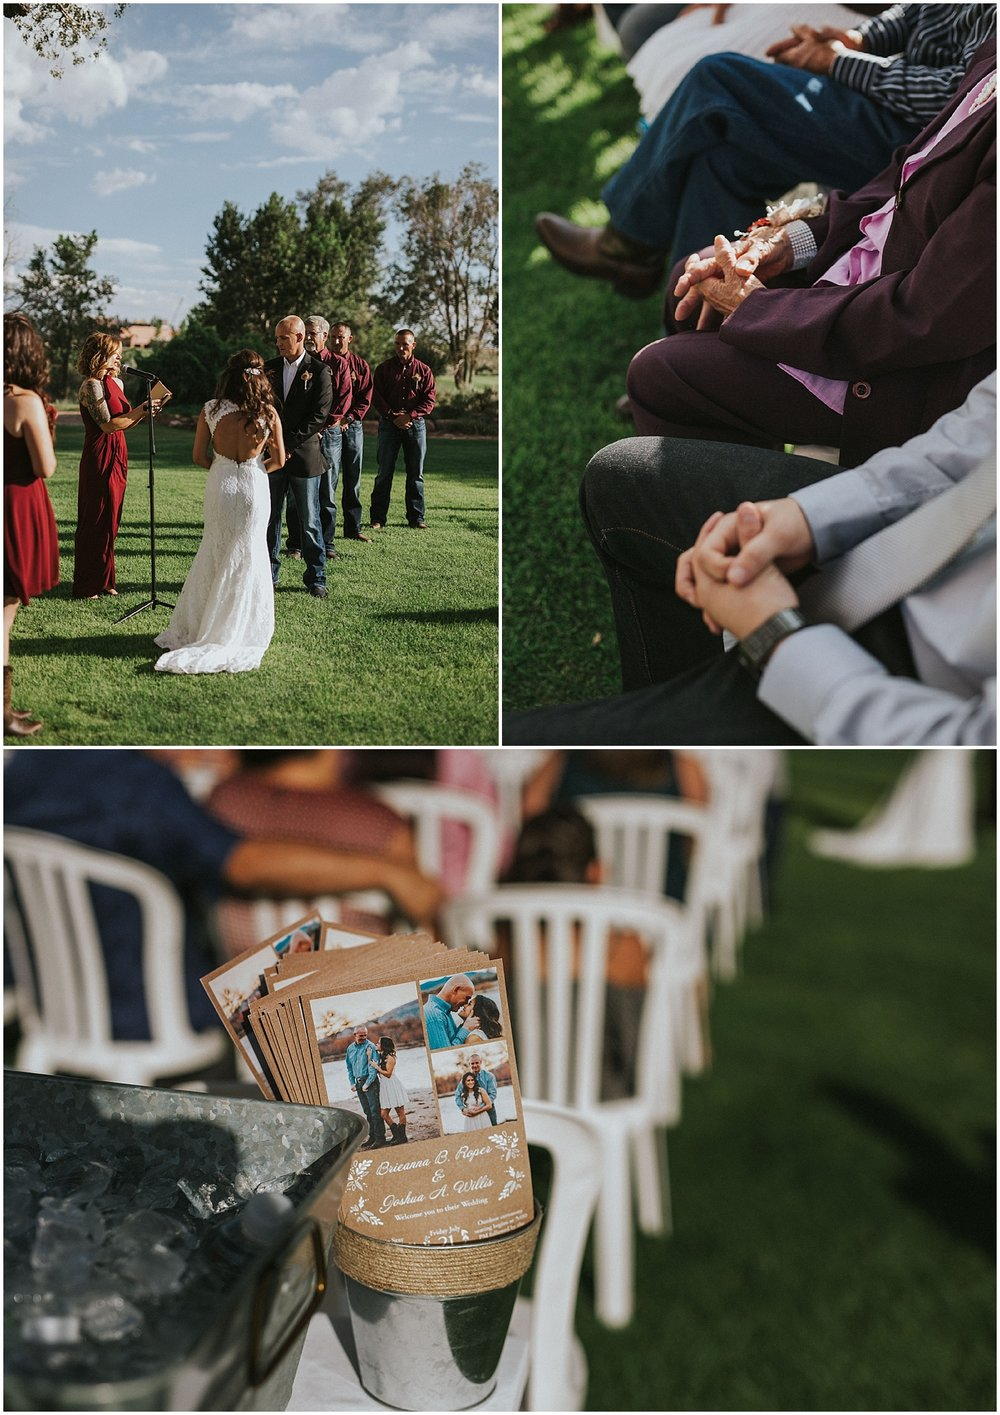 Prairie-Star-Restaurant_Wedding-Photos_Santa-Ana-Pueblo-New-Mexico_Albuquerque-New-Mexico-Wedding-Photographer_0024.jpg